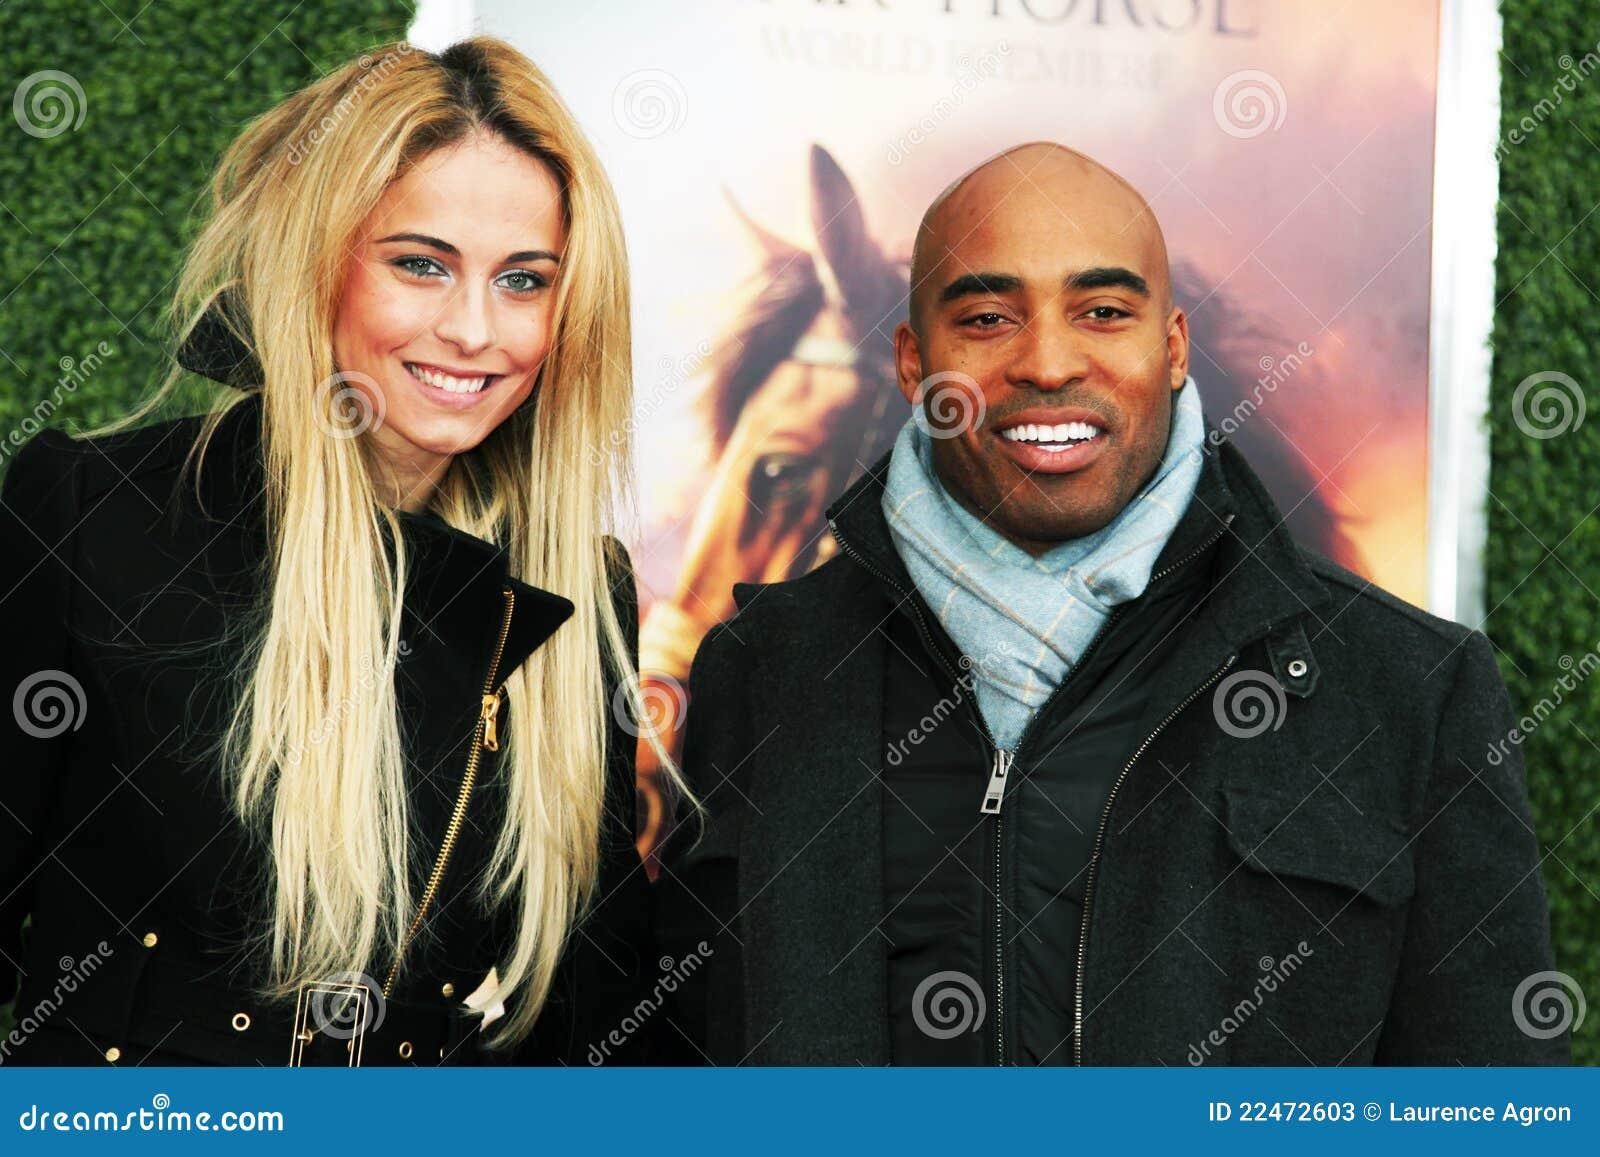 Traci Lynn Johnson and Tiki Barber